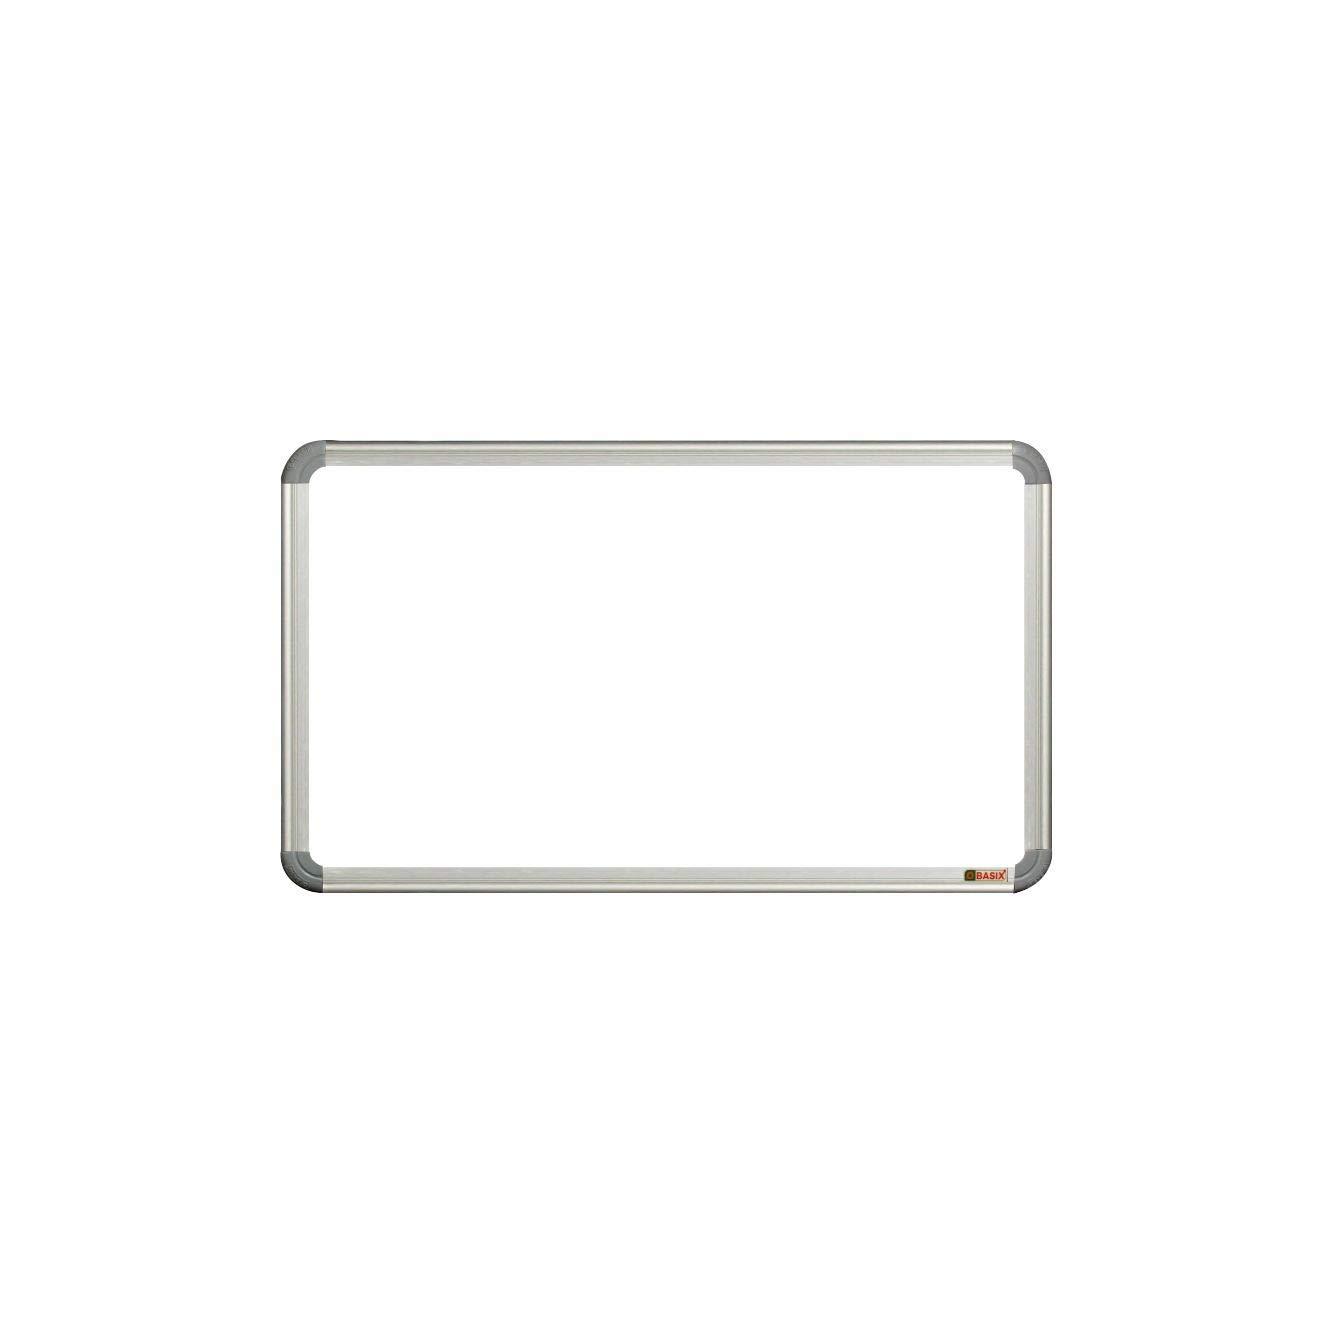 OBASIX White Board 1x2 Feet Non-Magnetic Classic Series CWB3060   Aluminium Frame (B07TZH8MR5) Amazon Price History, Amazon Price Tracker